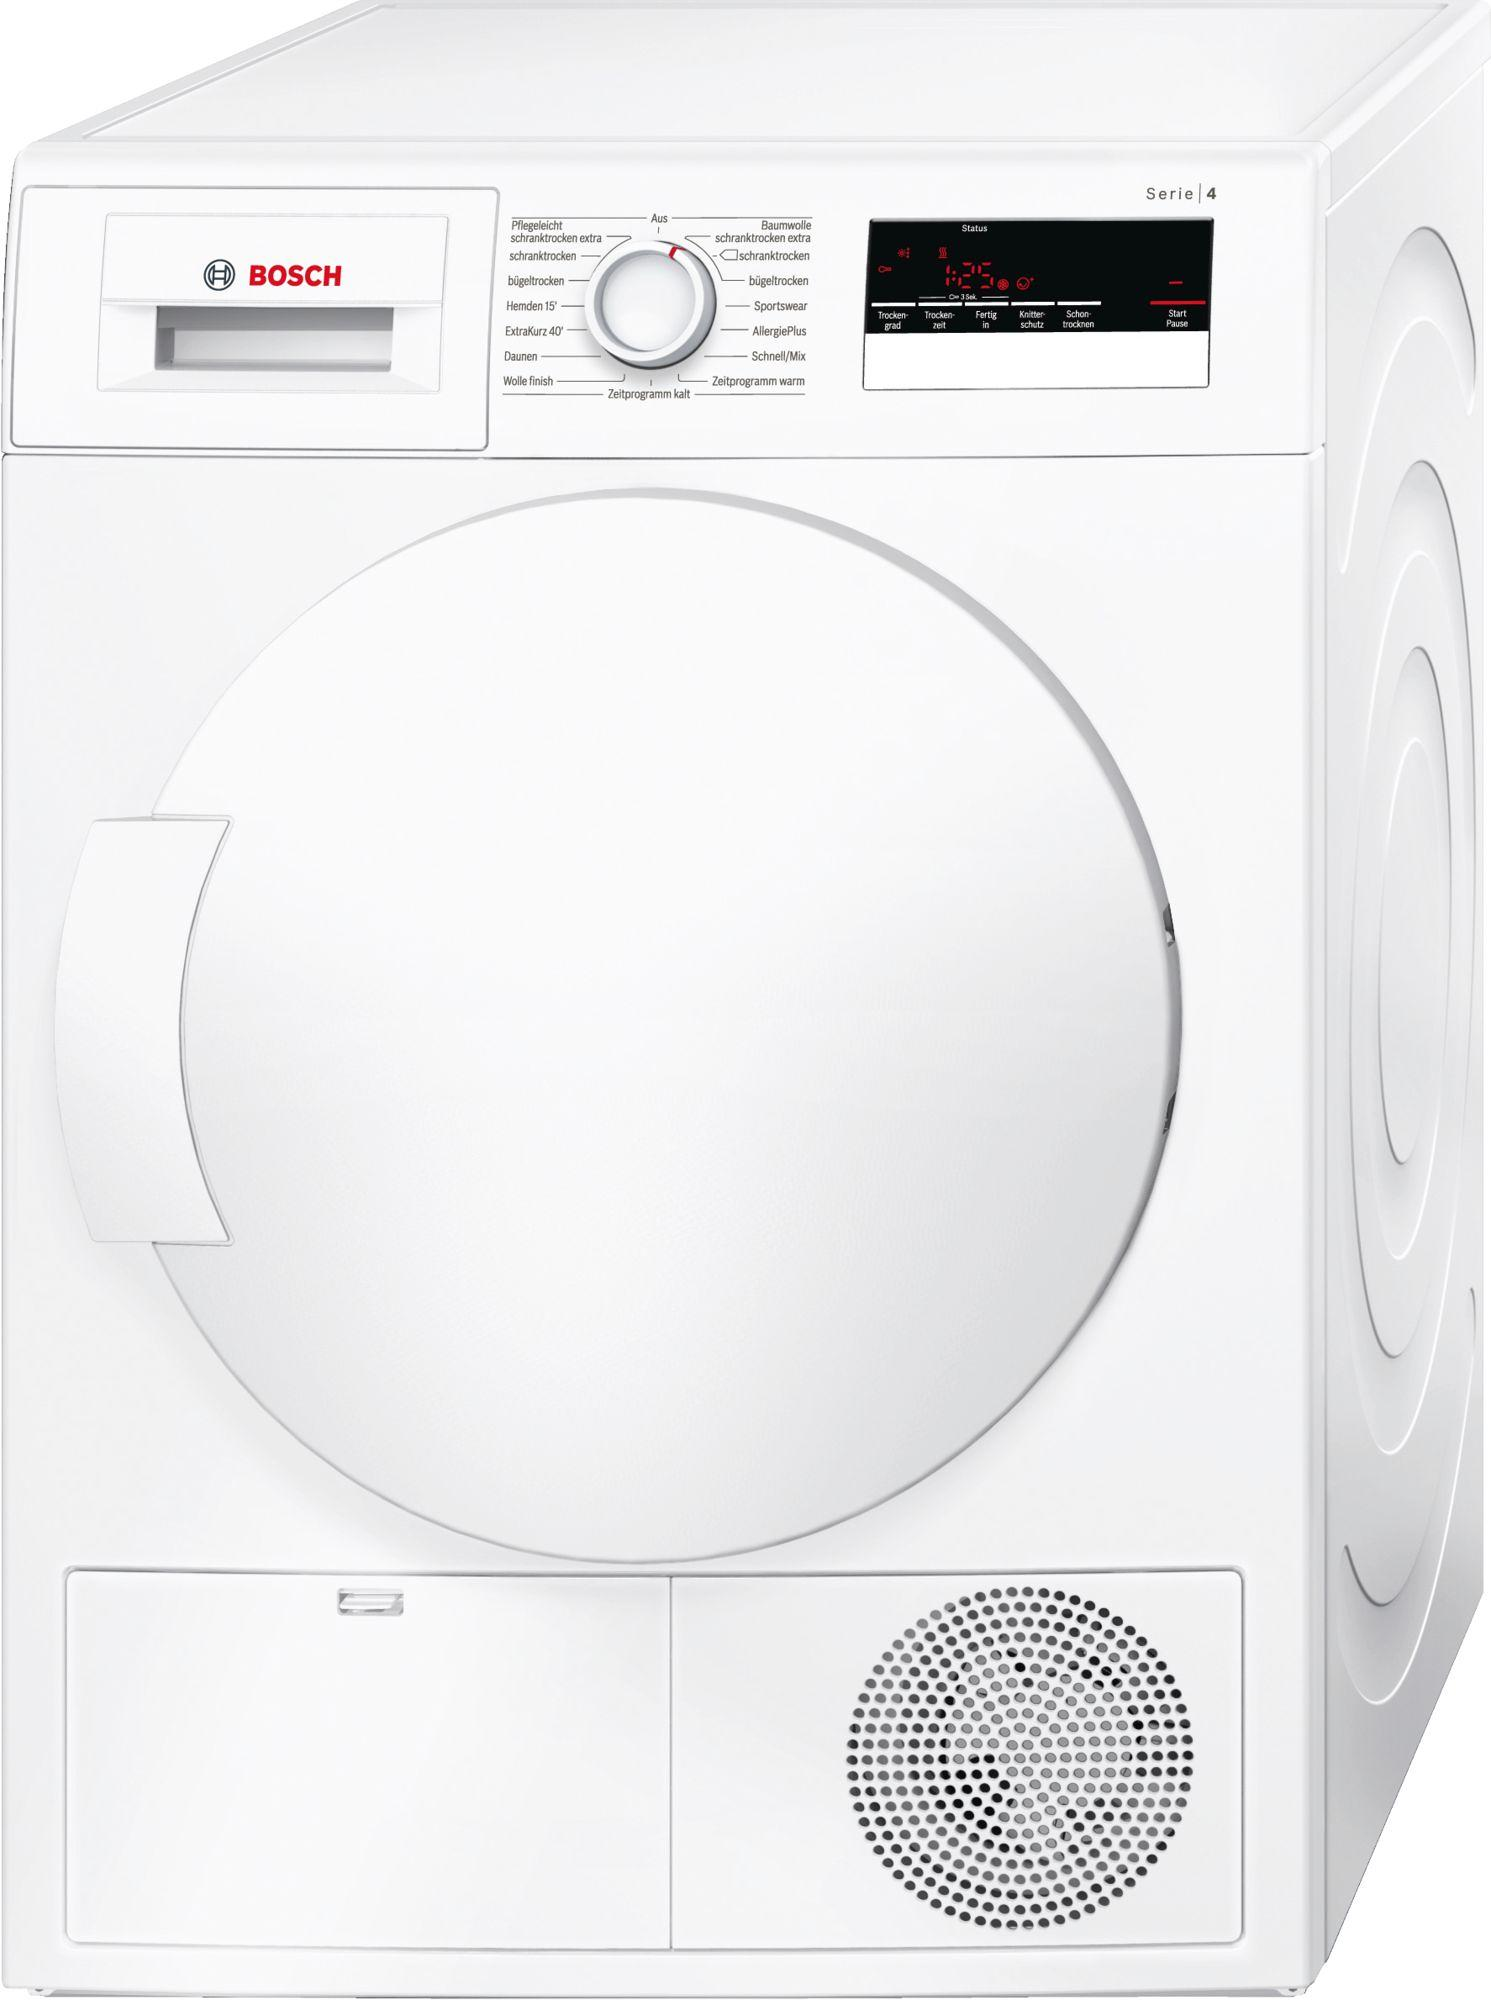 Bosch Wtn83200 Luftkondensations Waschetrockner Led Display